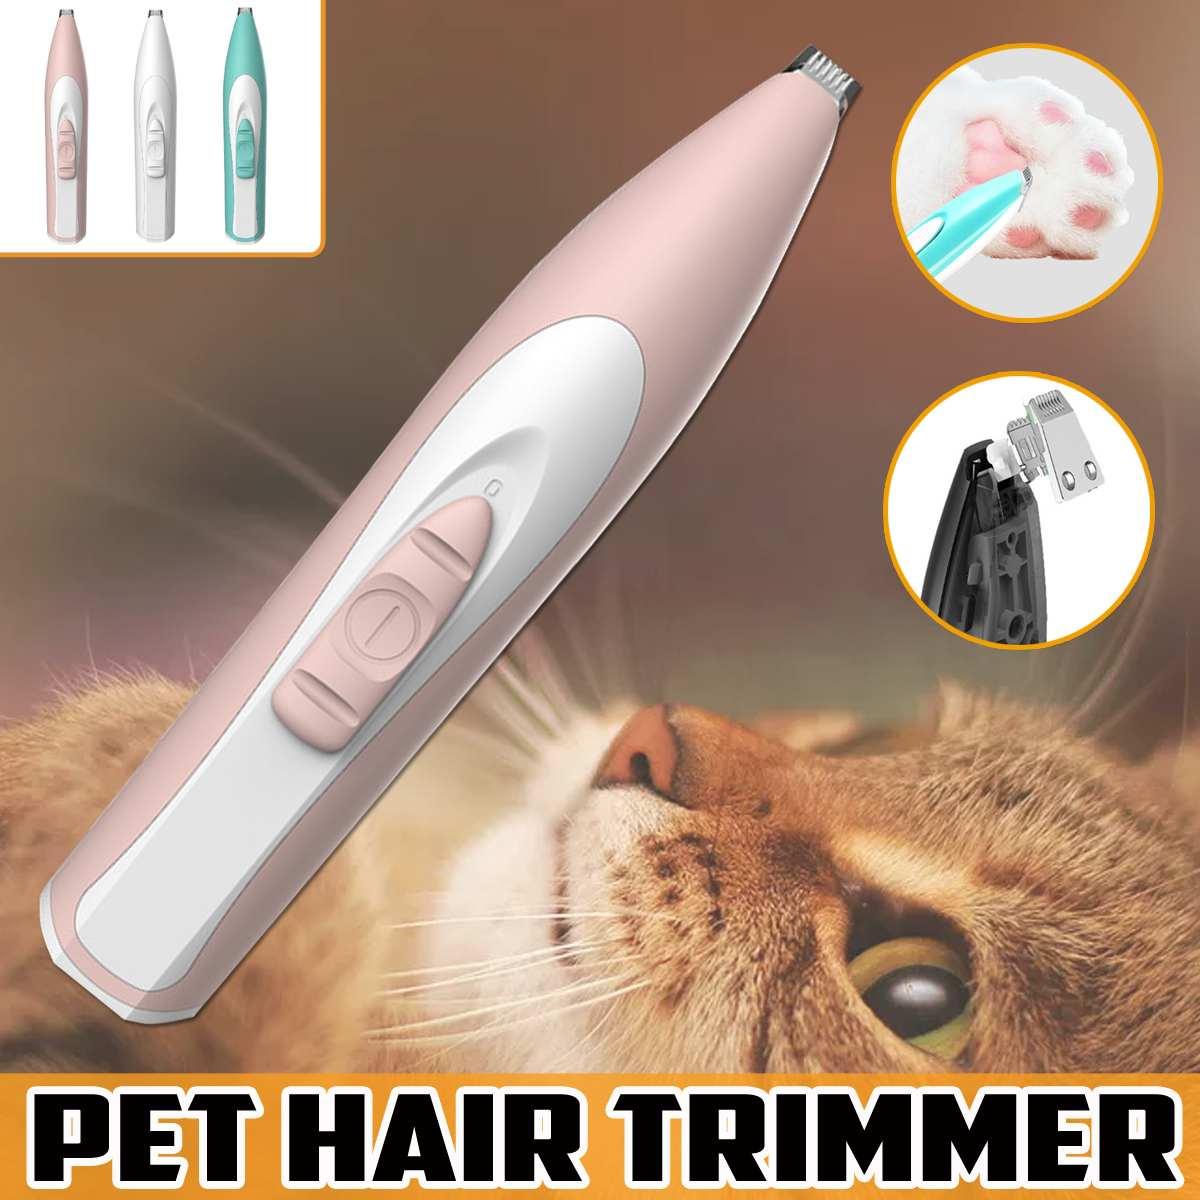 Cortadora profesional para pies de Mascota, cortadora para el pelo de perro, cortadora para crecimiento de perros, cortadora recargable por USB para orejas, removedora de pelo de ojos, poco ruido